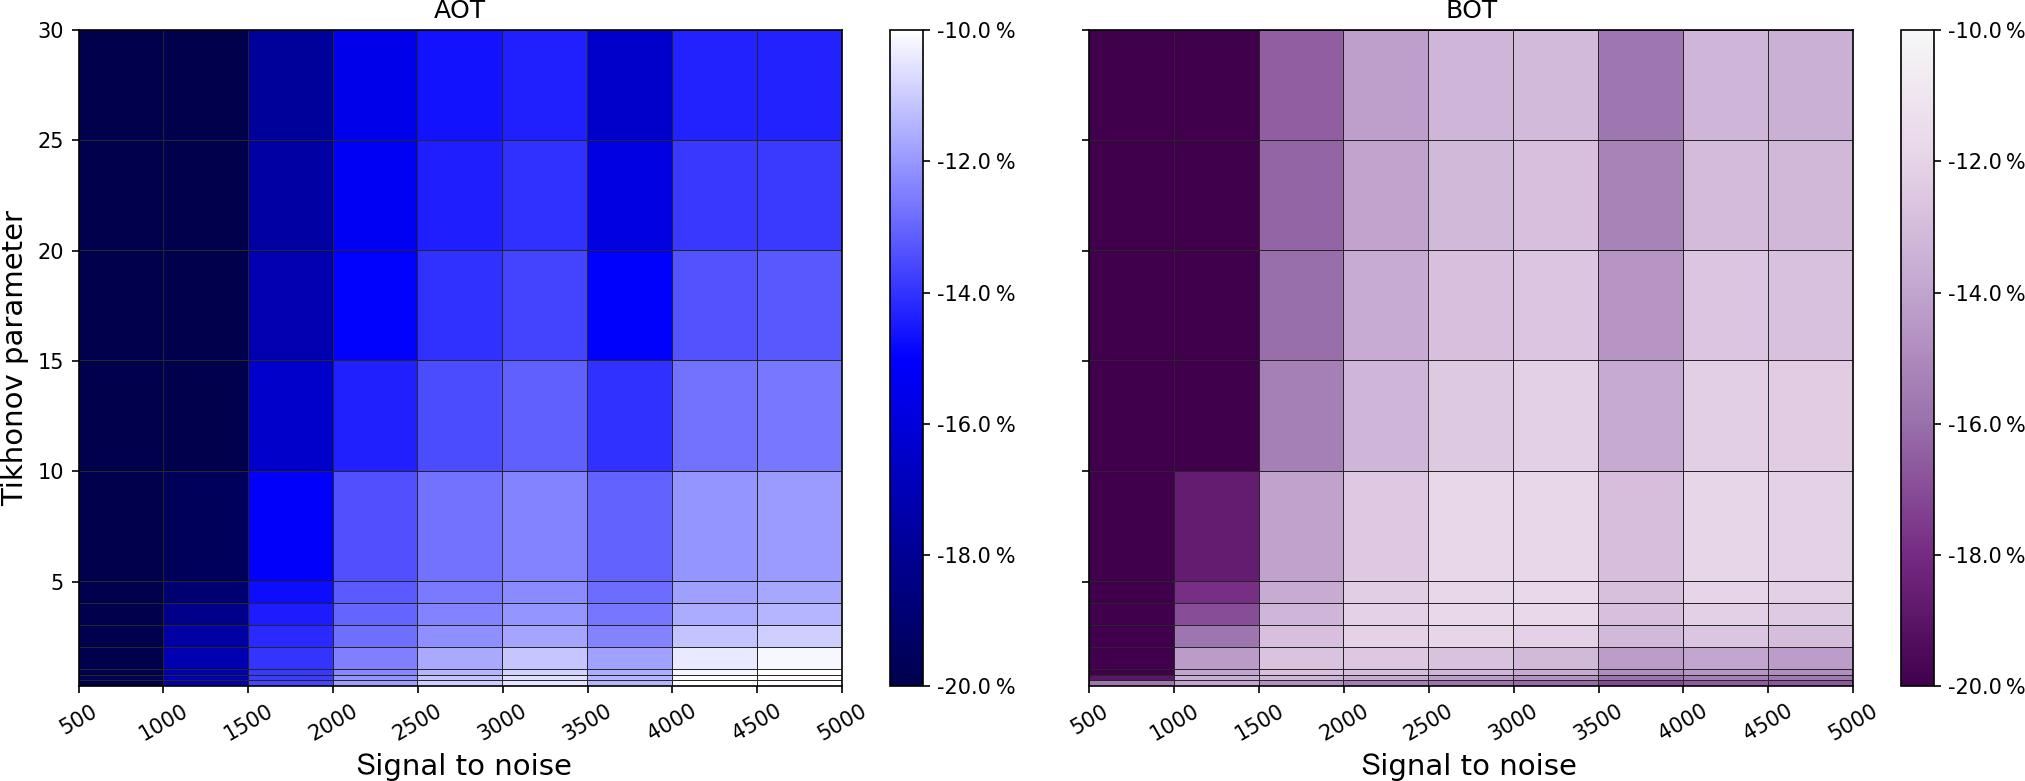 AMT - BOREAS – a new MAX-DOAS profile retrieval algorithm